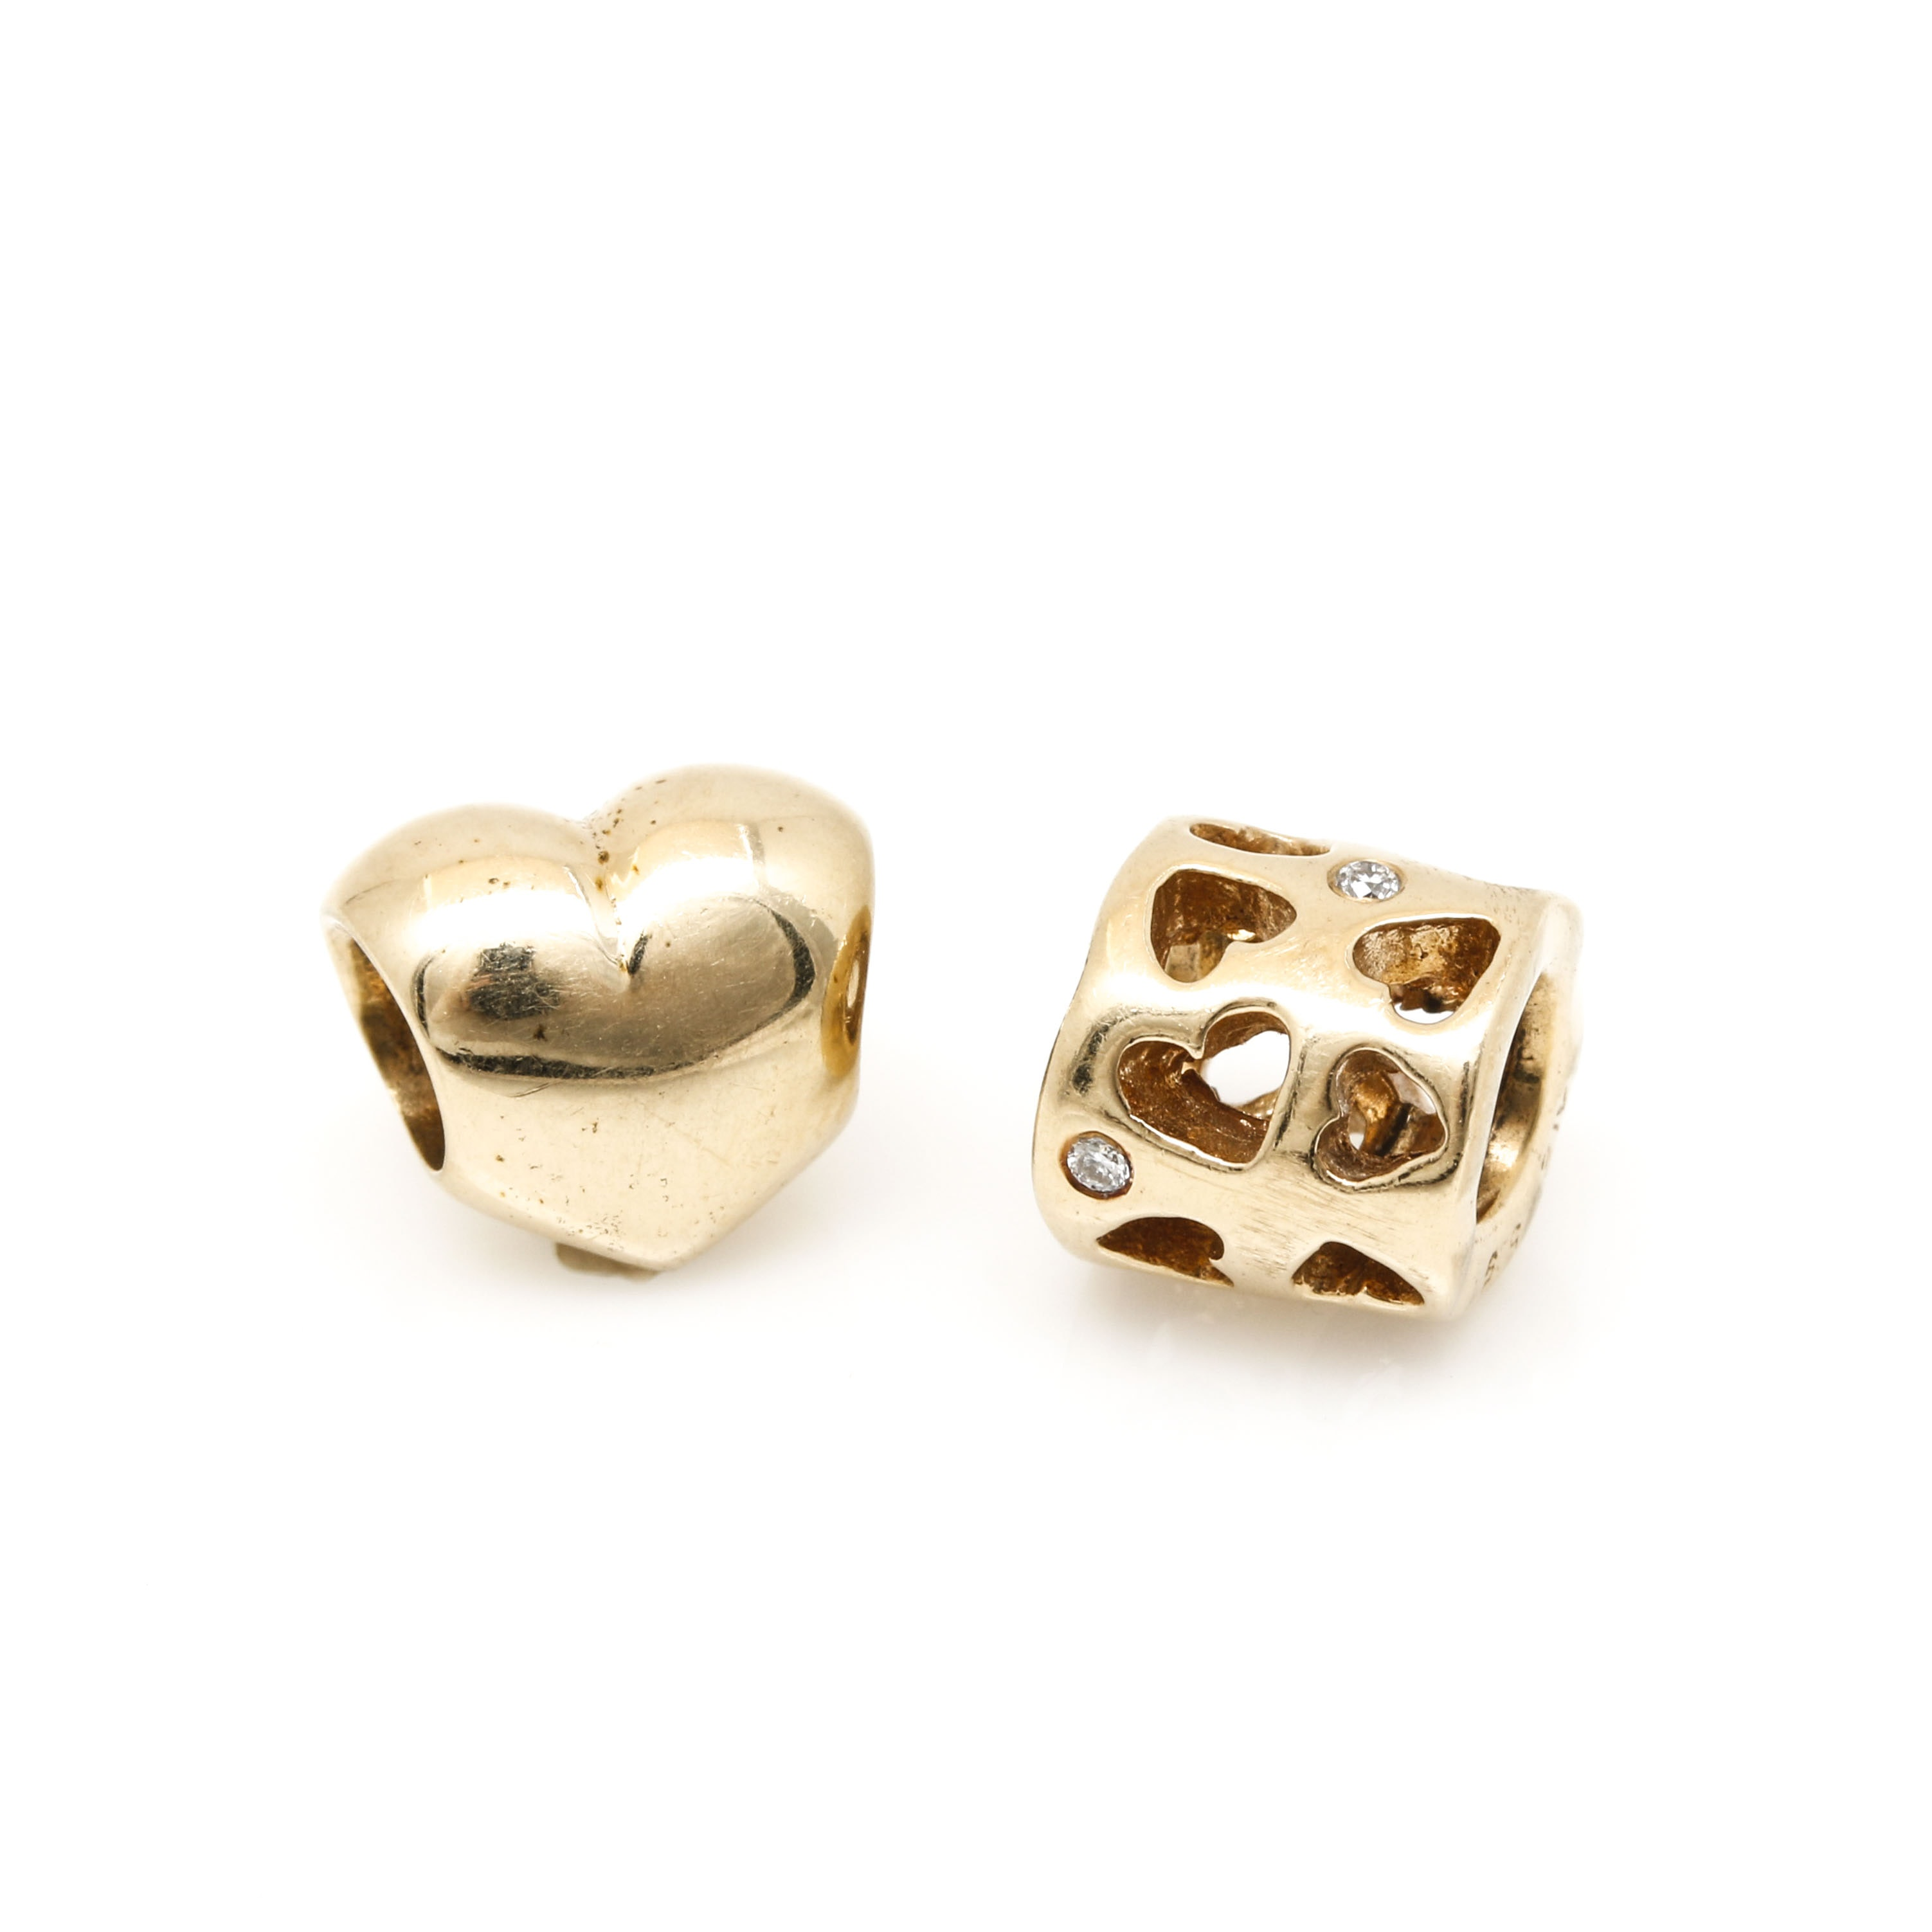 Pandora 14K Yellow Gold Heart Themed Charms Including Diamonds